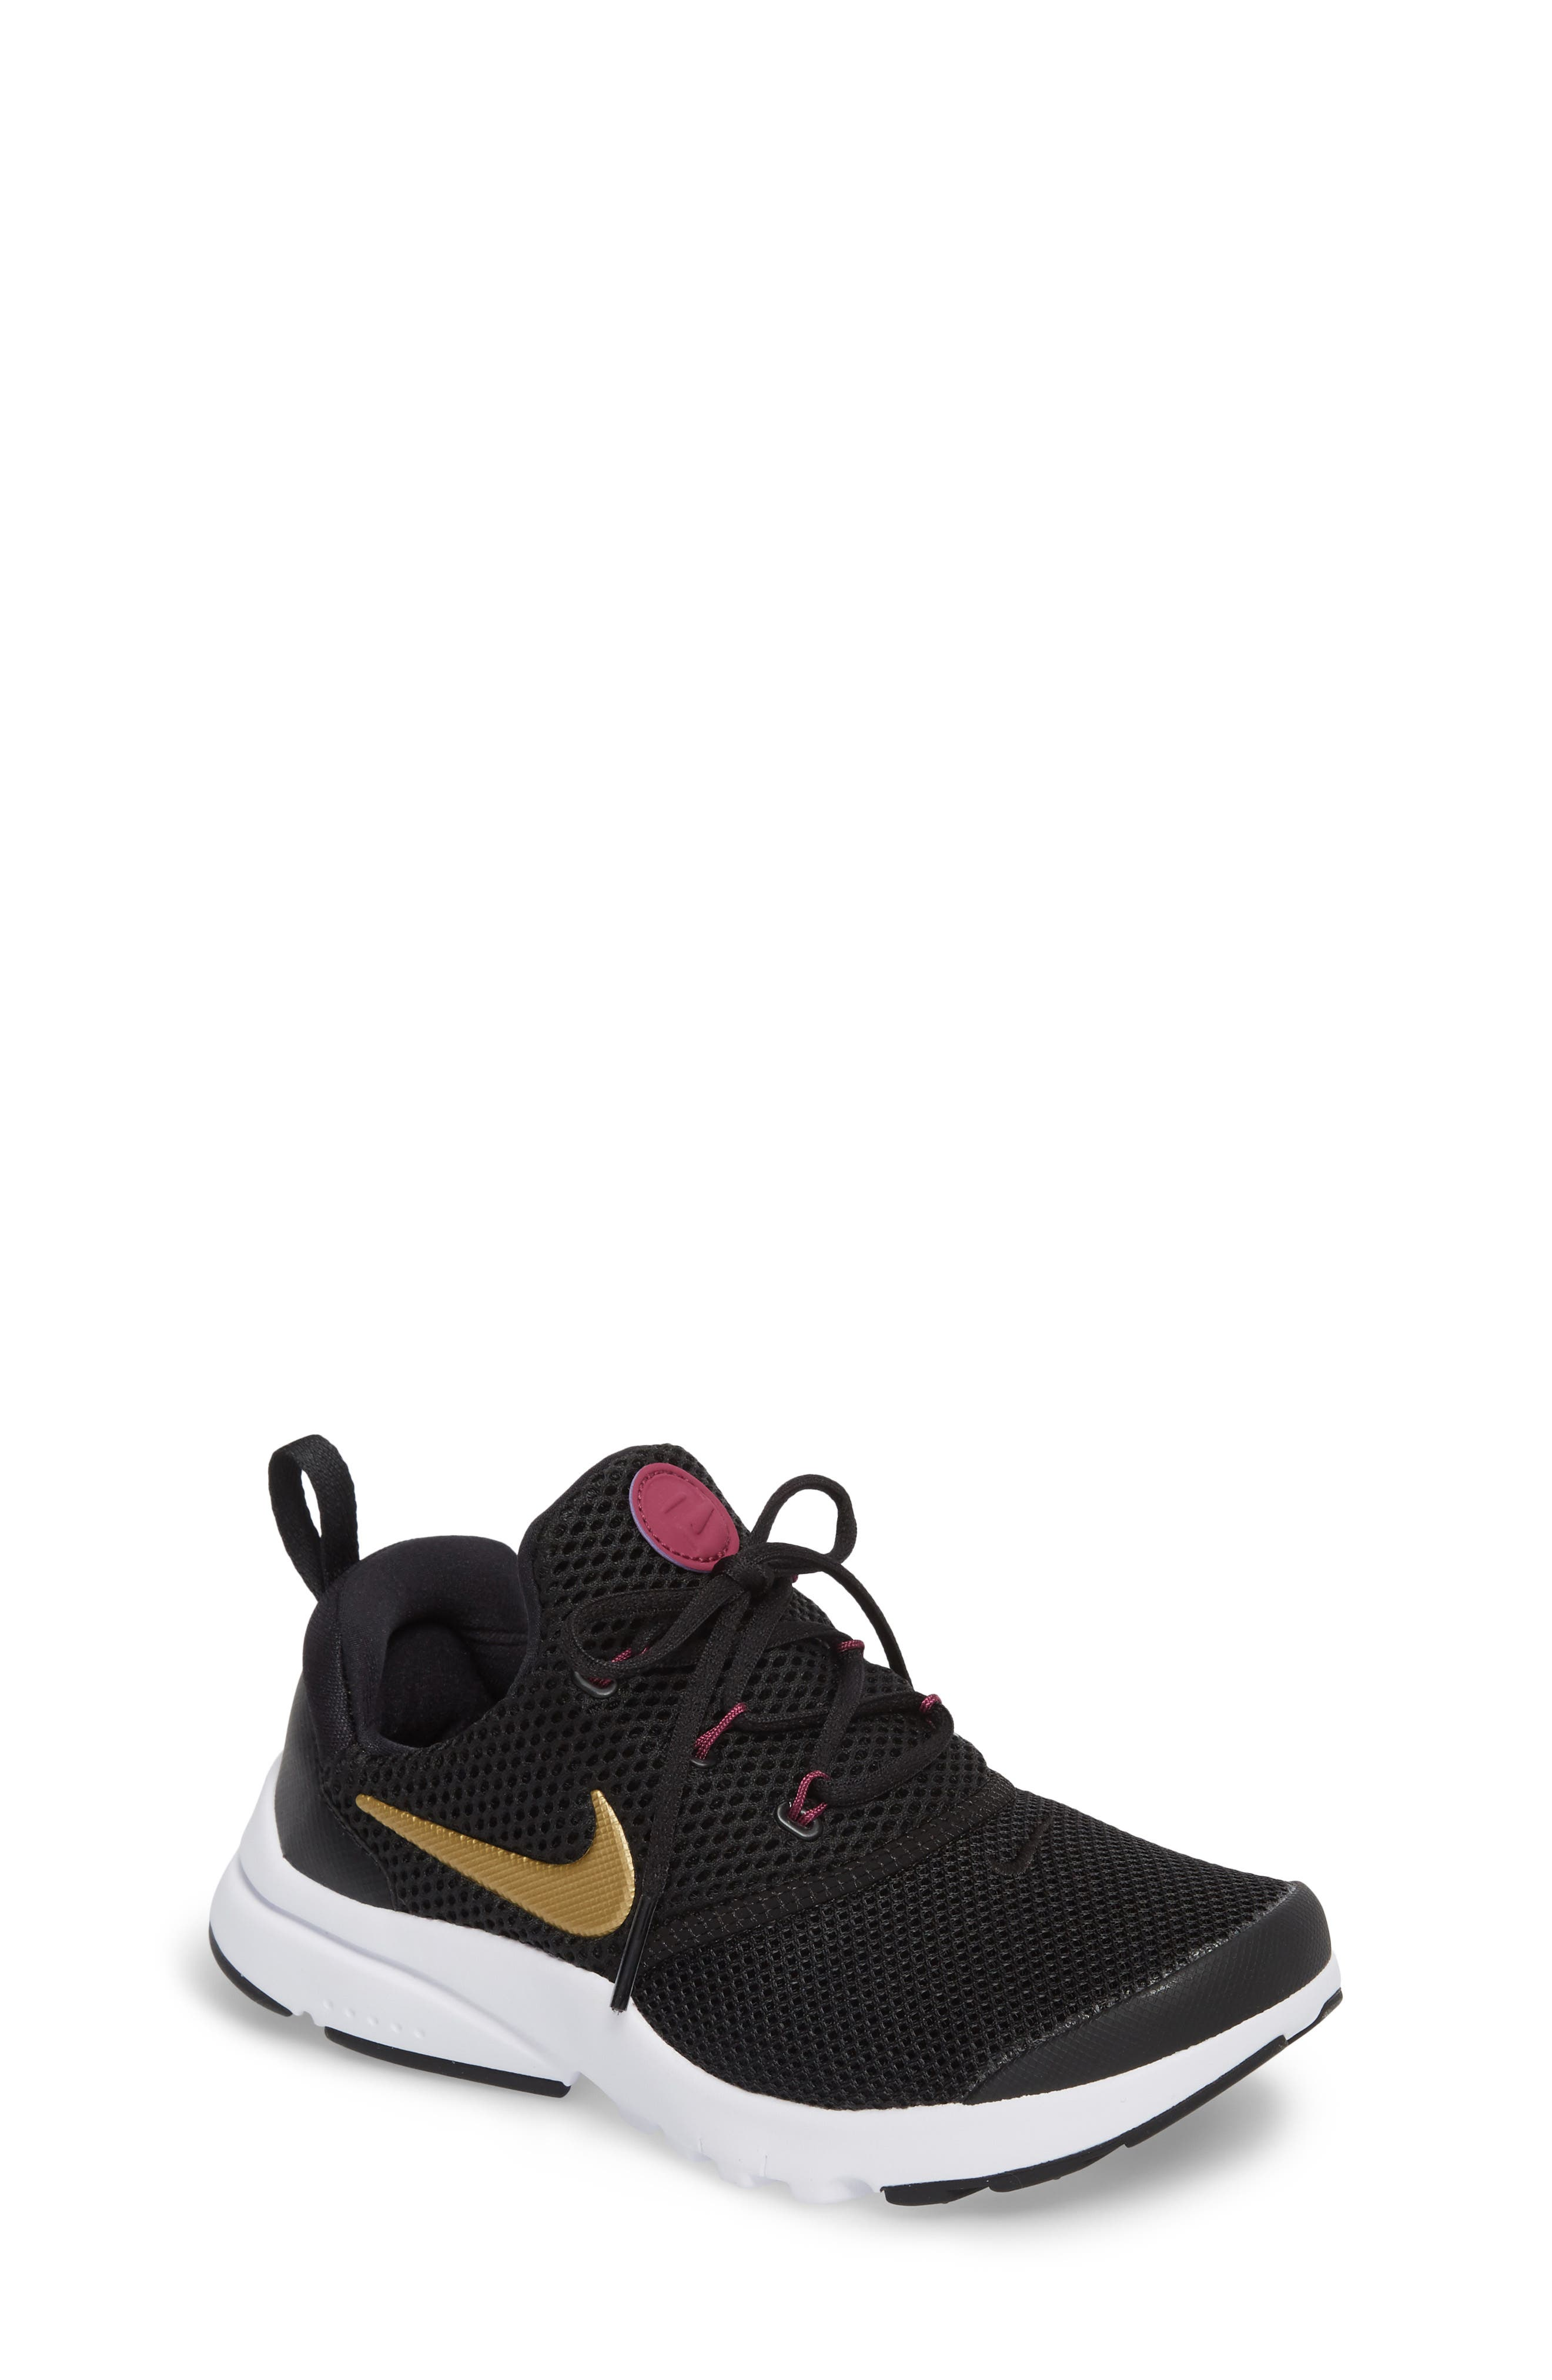 Presto Fly PS Sneaker,                             Main thumbnail 1, color,                             Black/ Gold